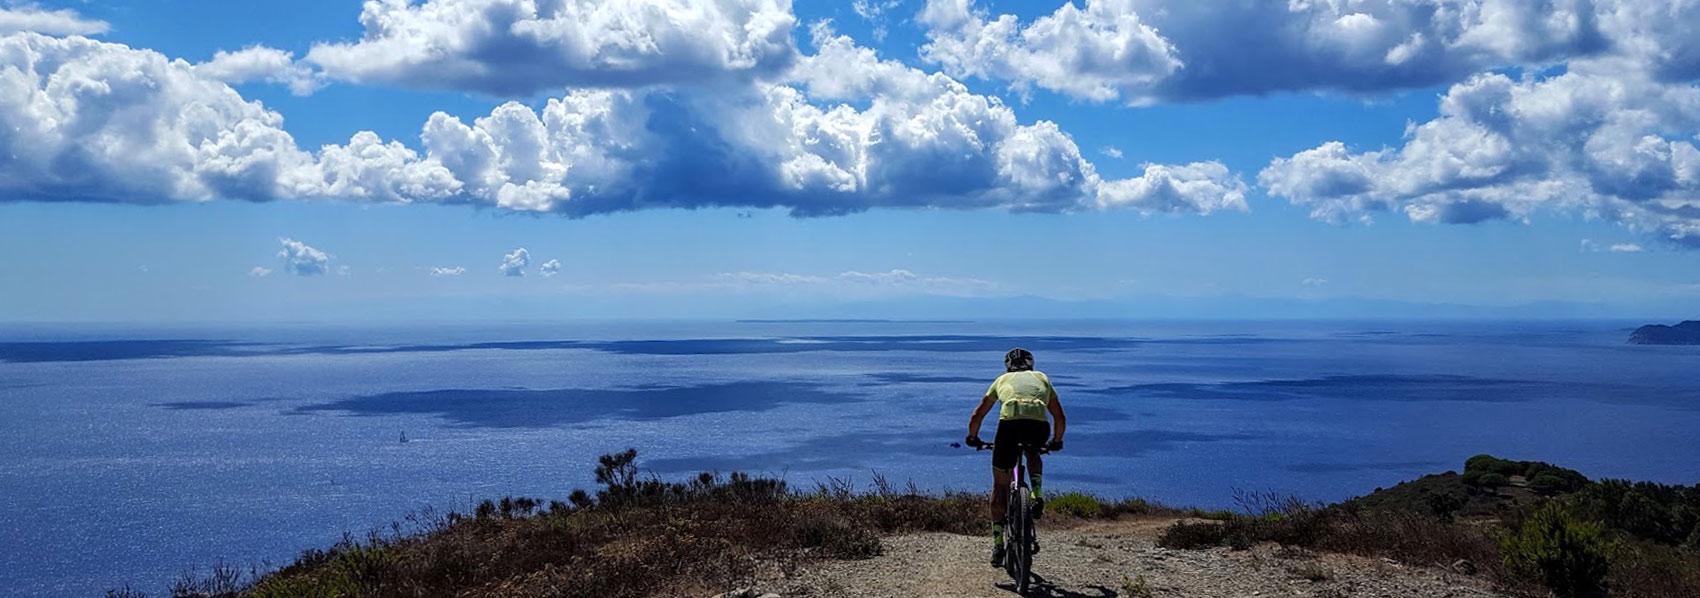 Isola d'Elba mountain bike